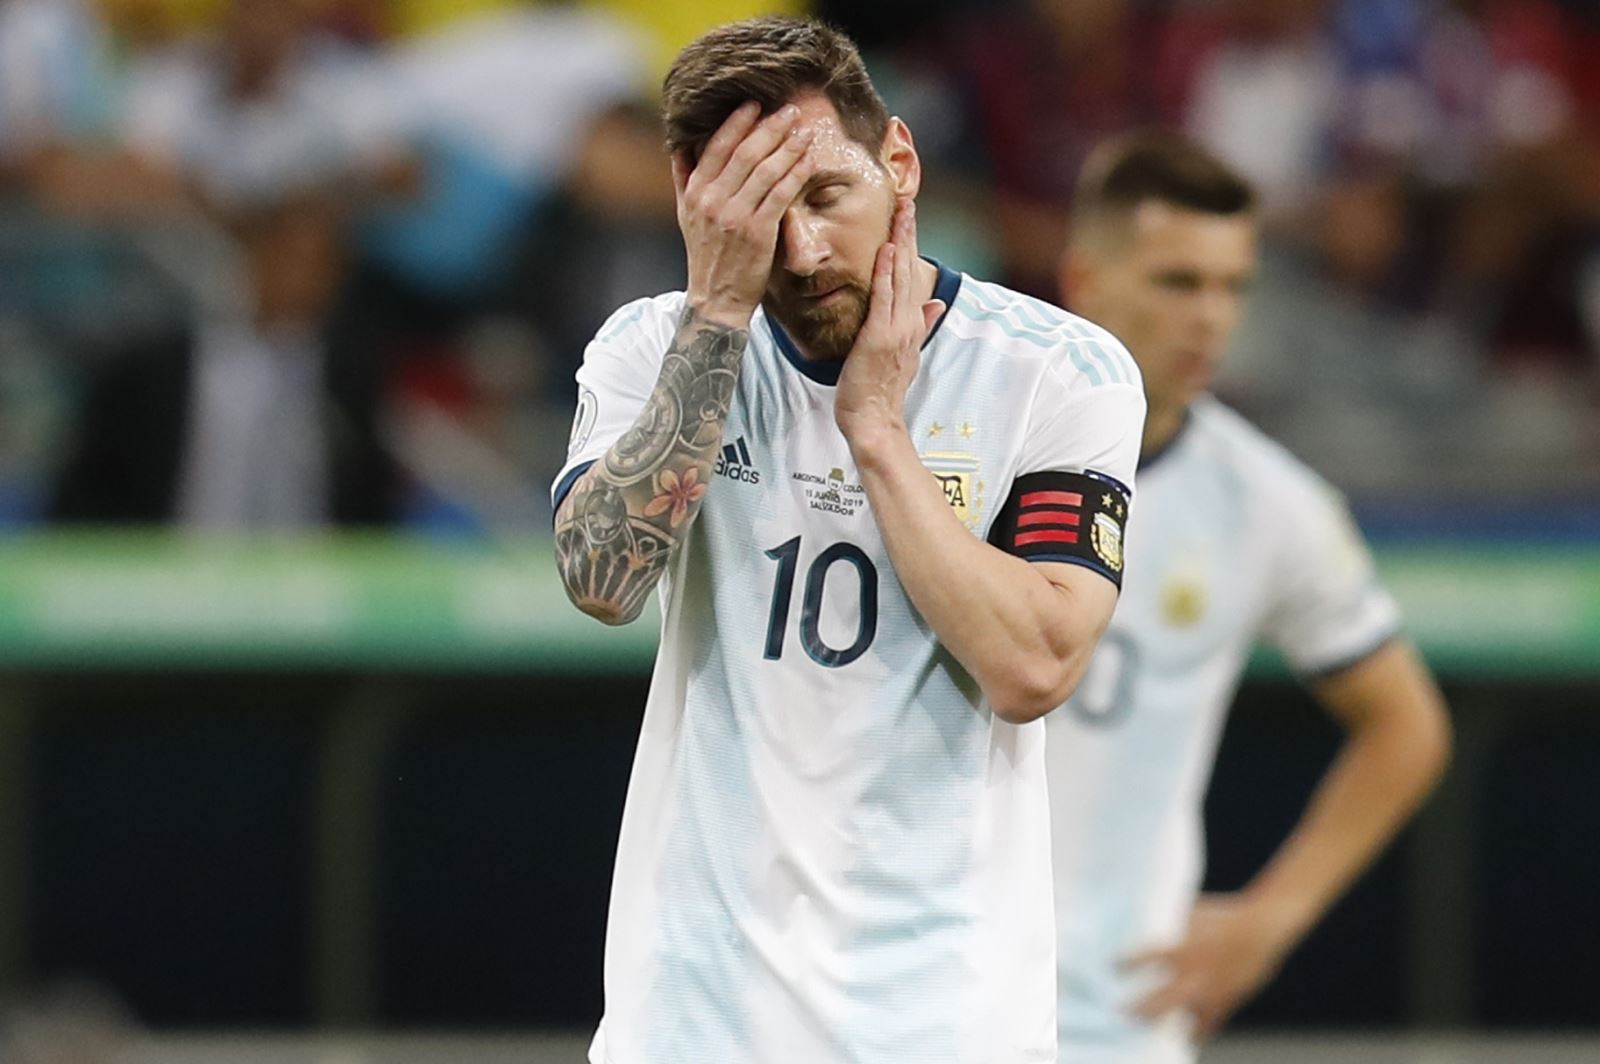 MU, pogba, manchester united, paul pogba, lukaku, inter milan, barcelona, coutinho, messi, argentina, copa america, chuyển nhượng, tin chuyển nhượng, chuyển nhượng MU